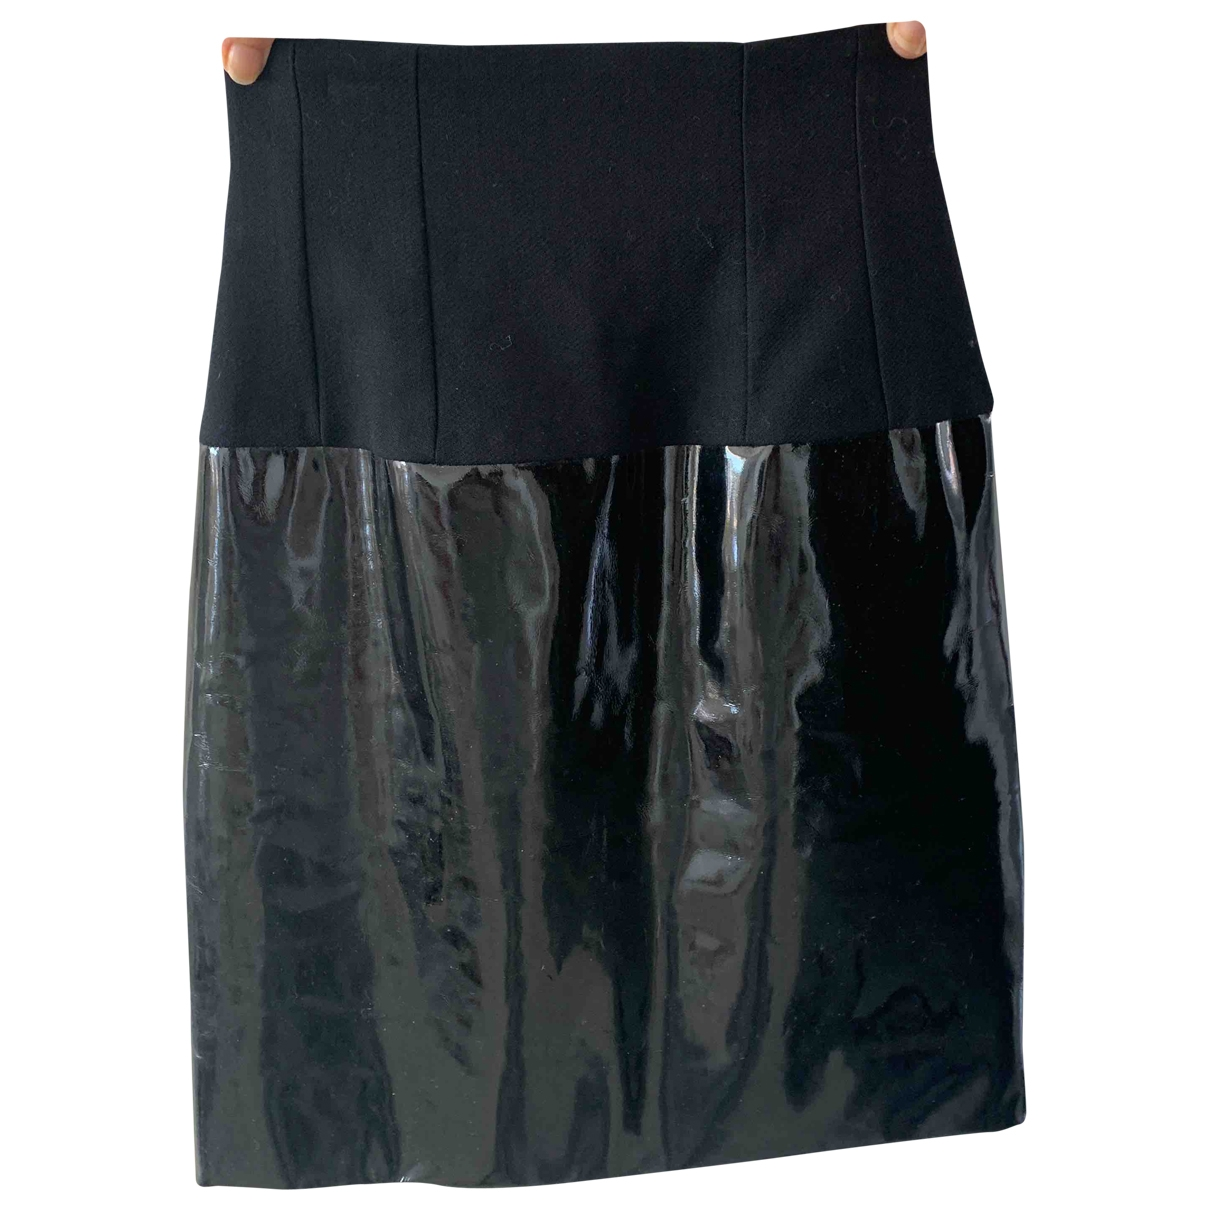 Dior \N Black Patent leather skirt for Women 34 FR